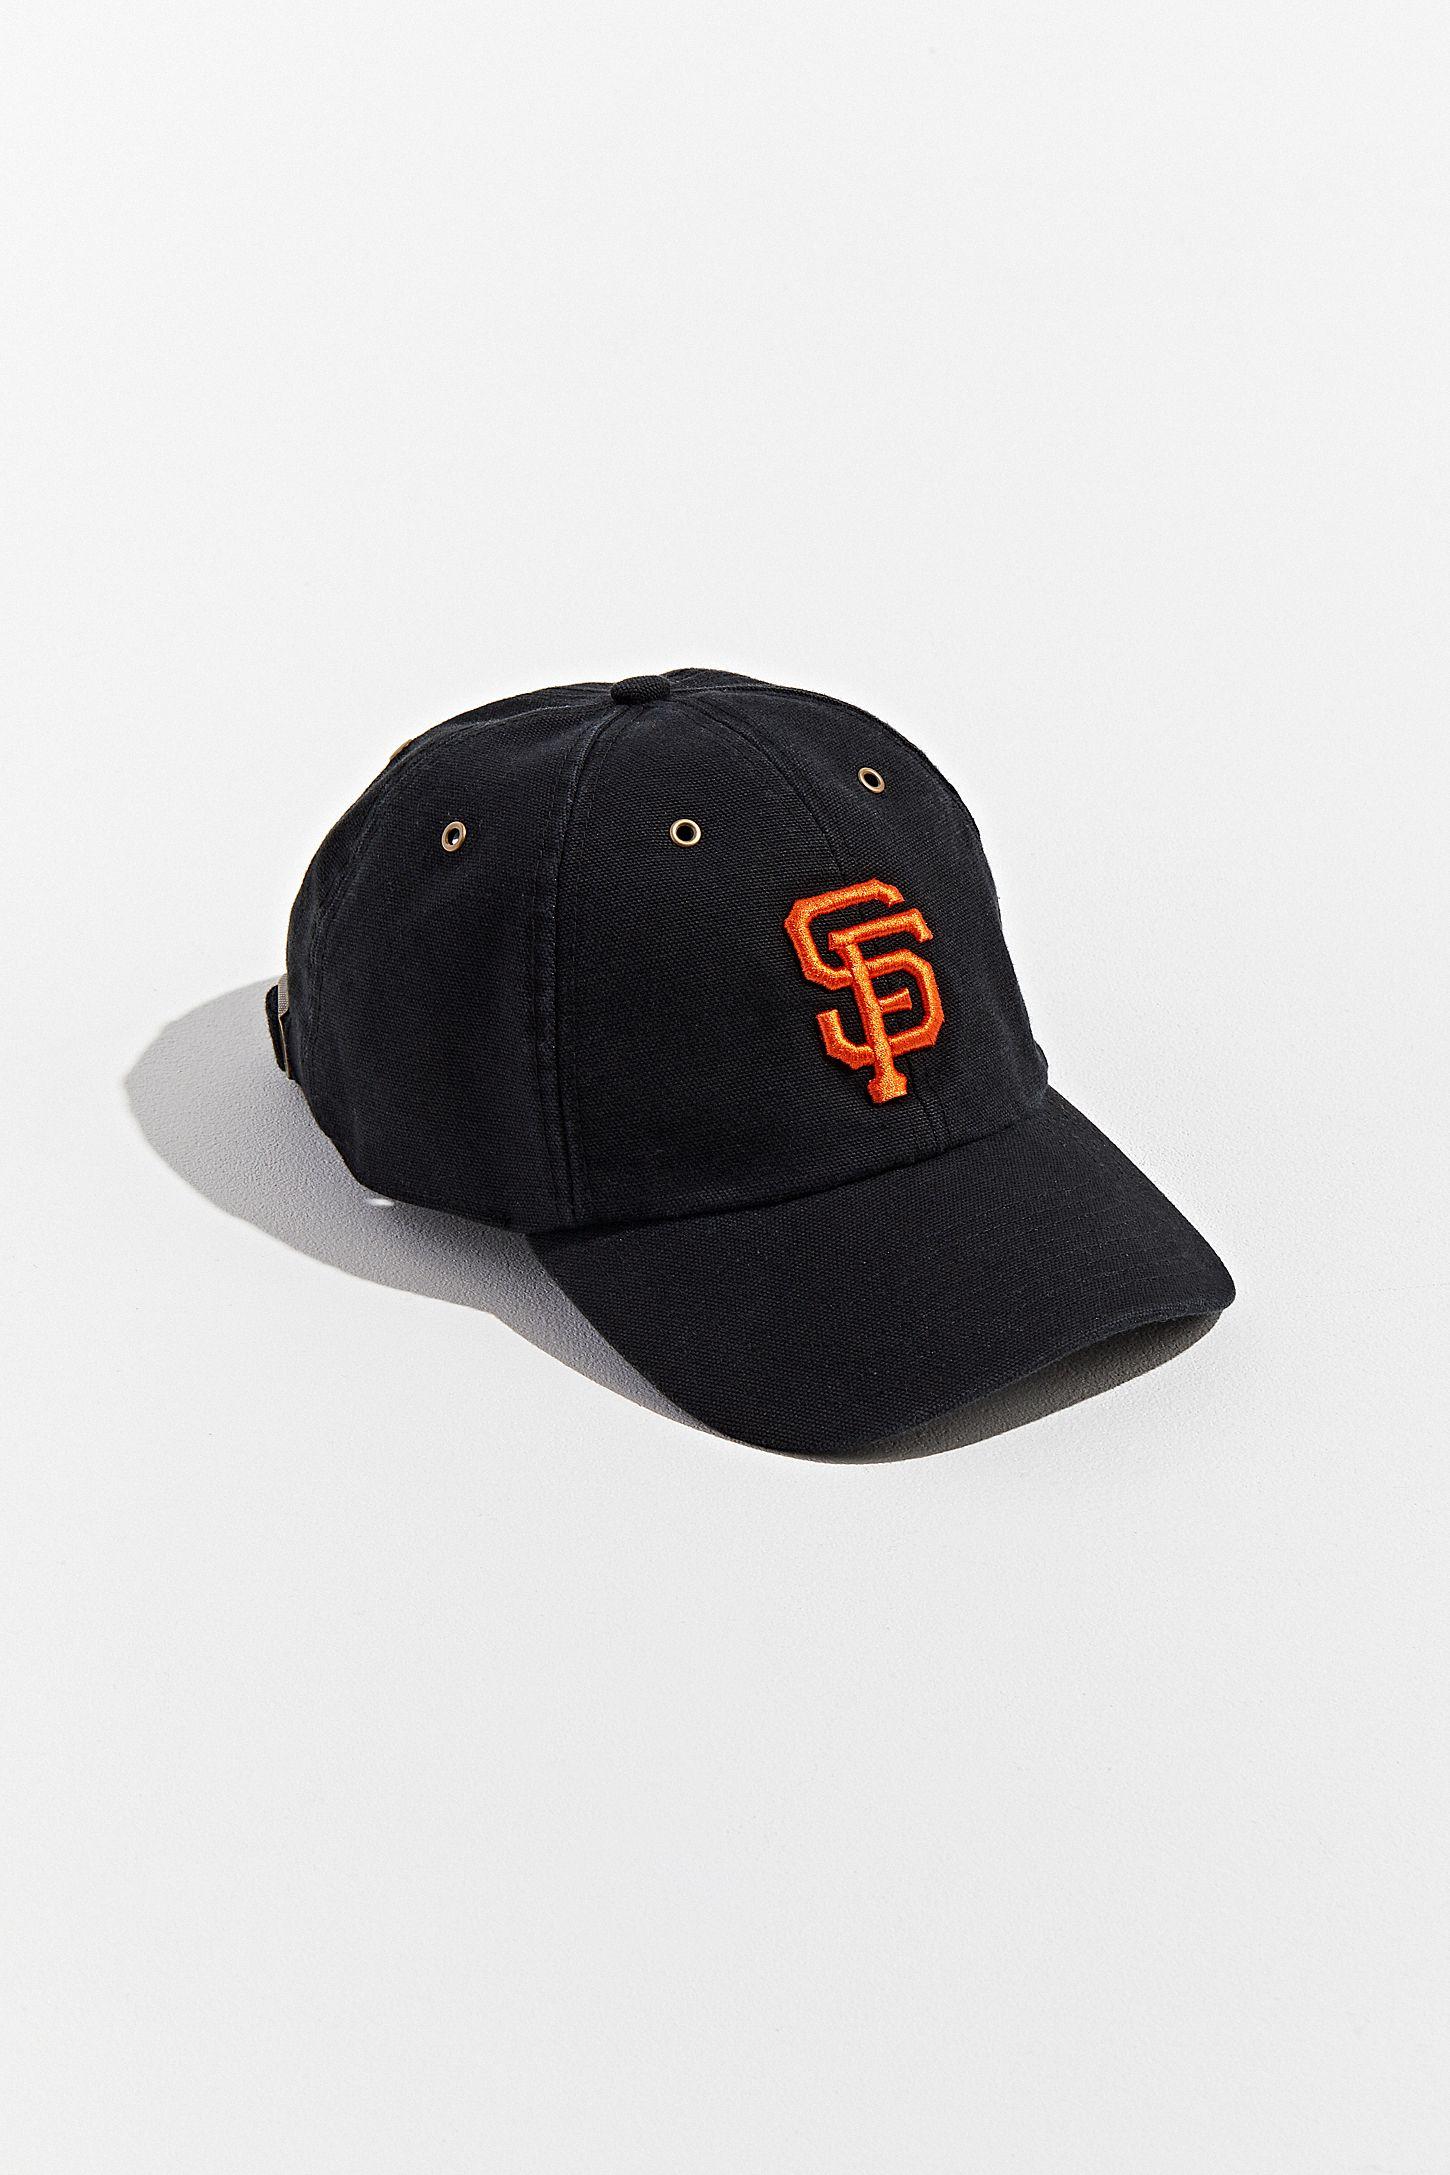 b806d41be '47 Brand X Carhartt San Francisco Giants Dad Baseball Hat